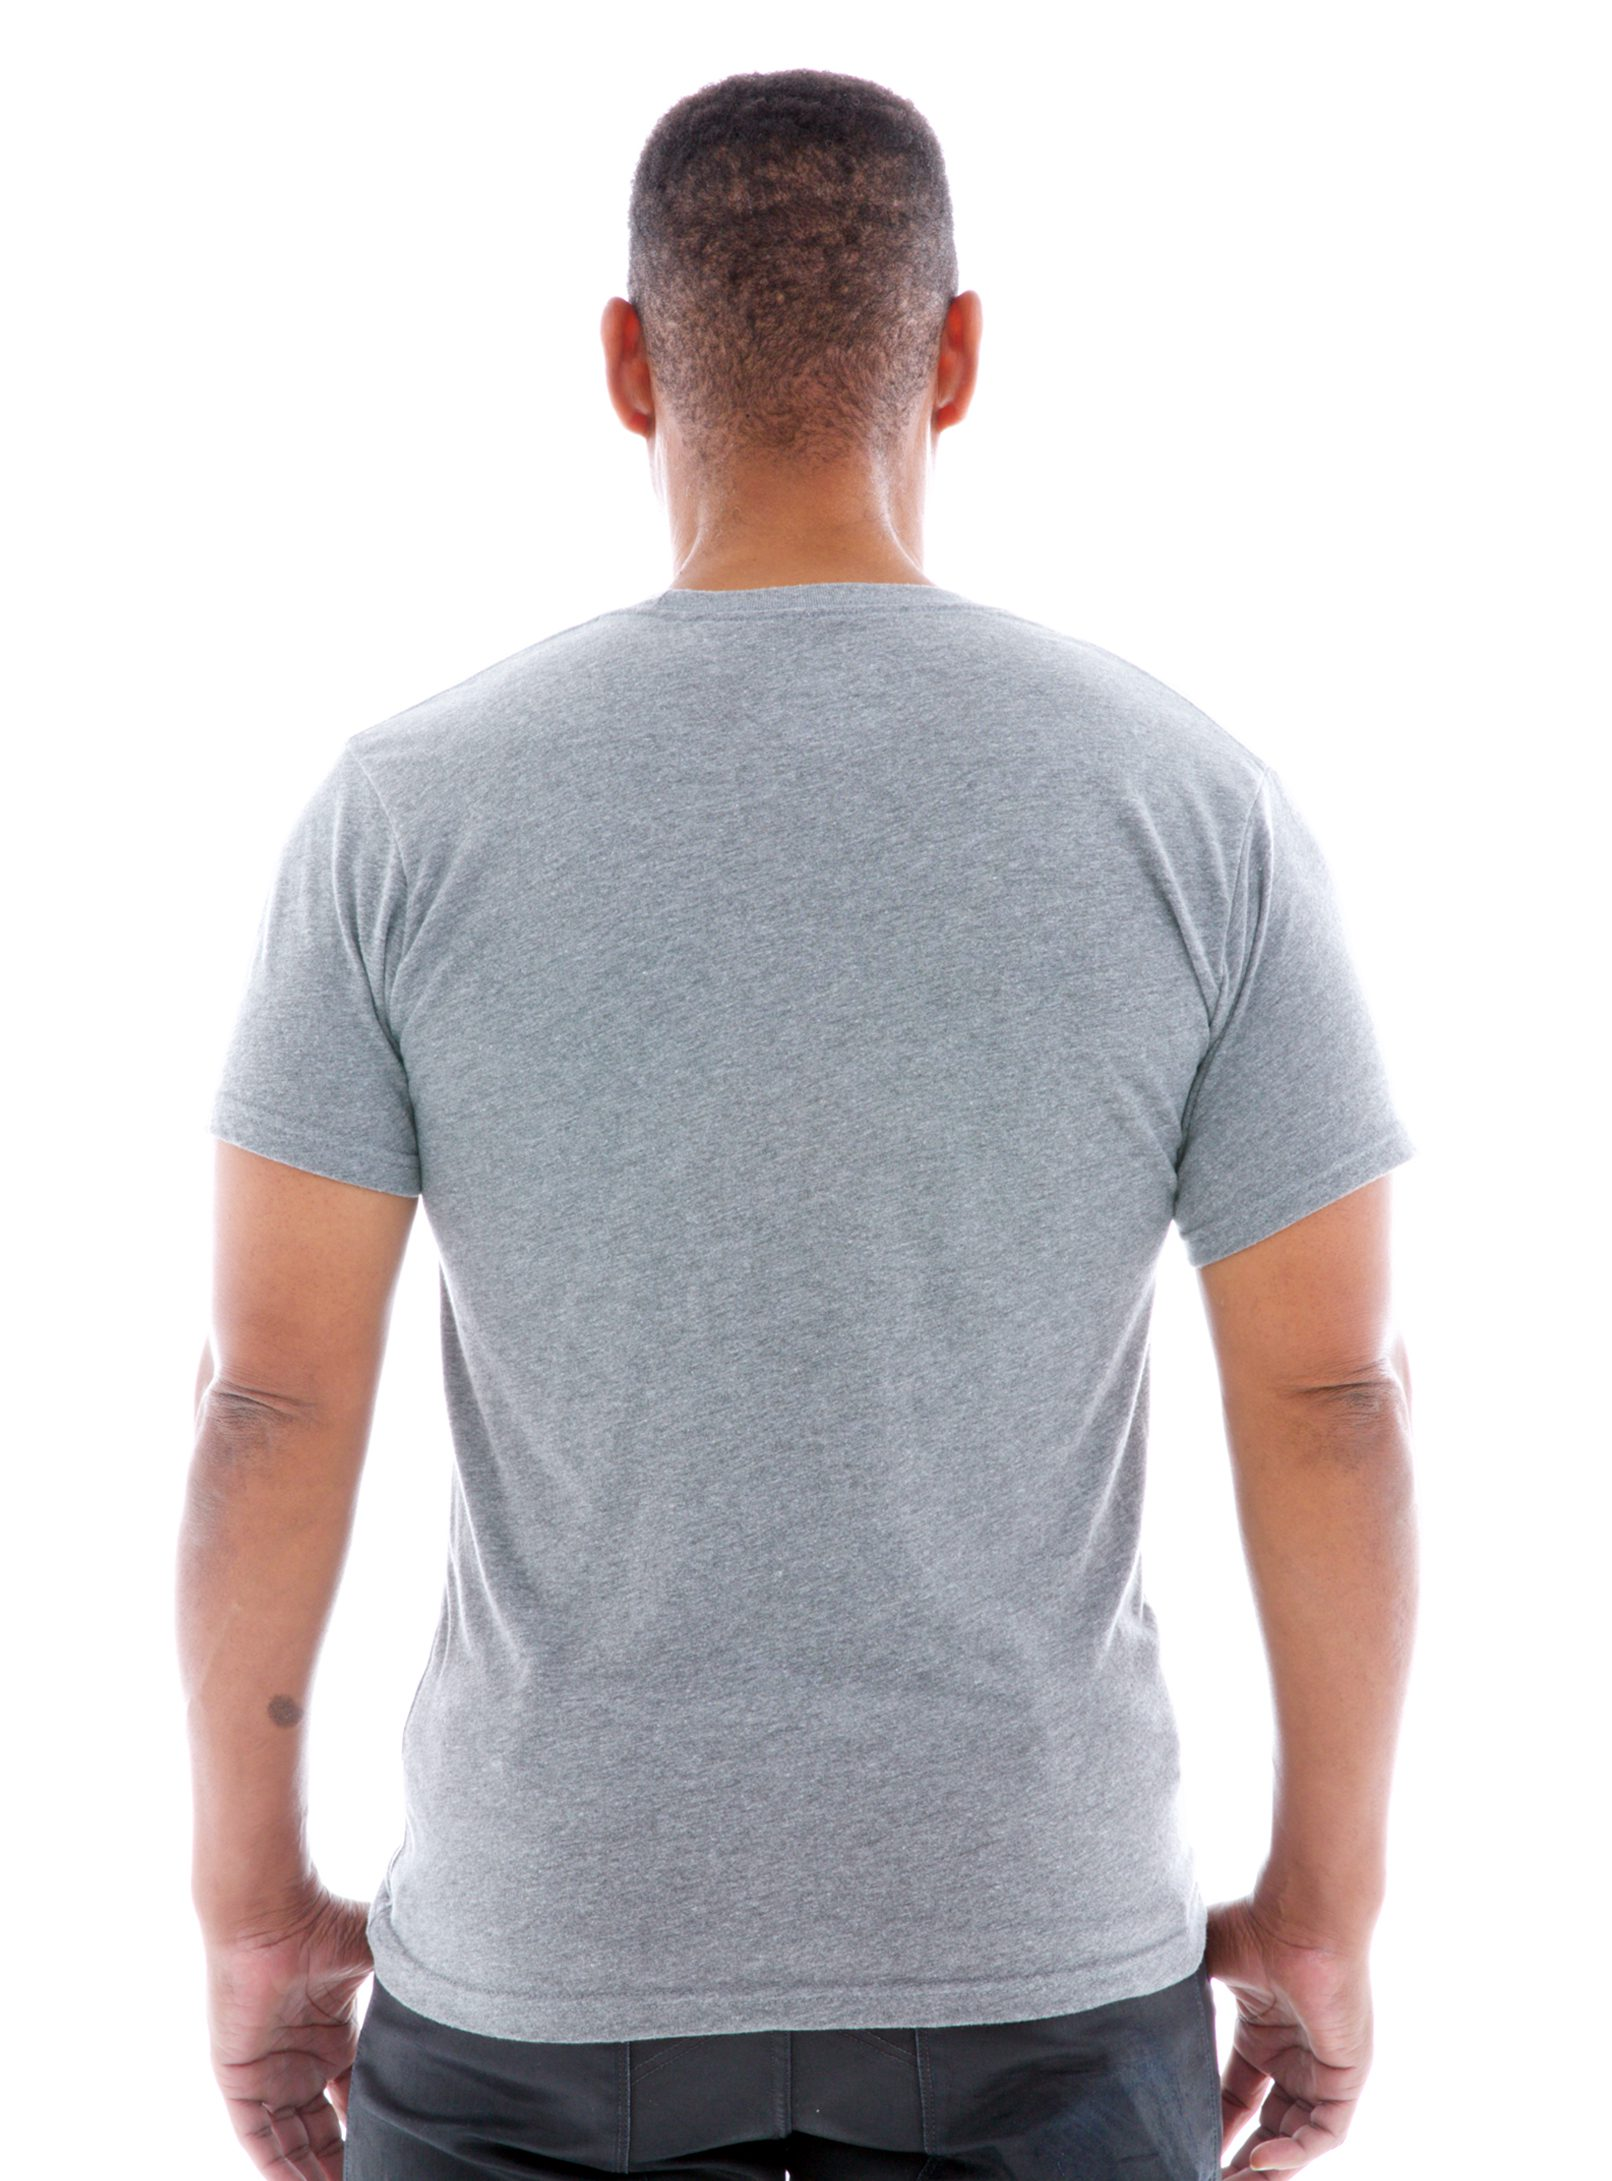 Triblend Jersey Crew Short Sleeve T-Shirt Back View